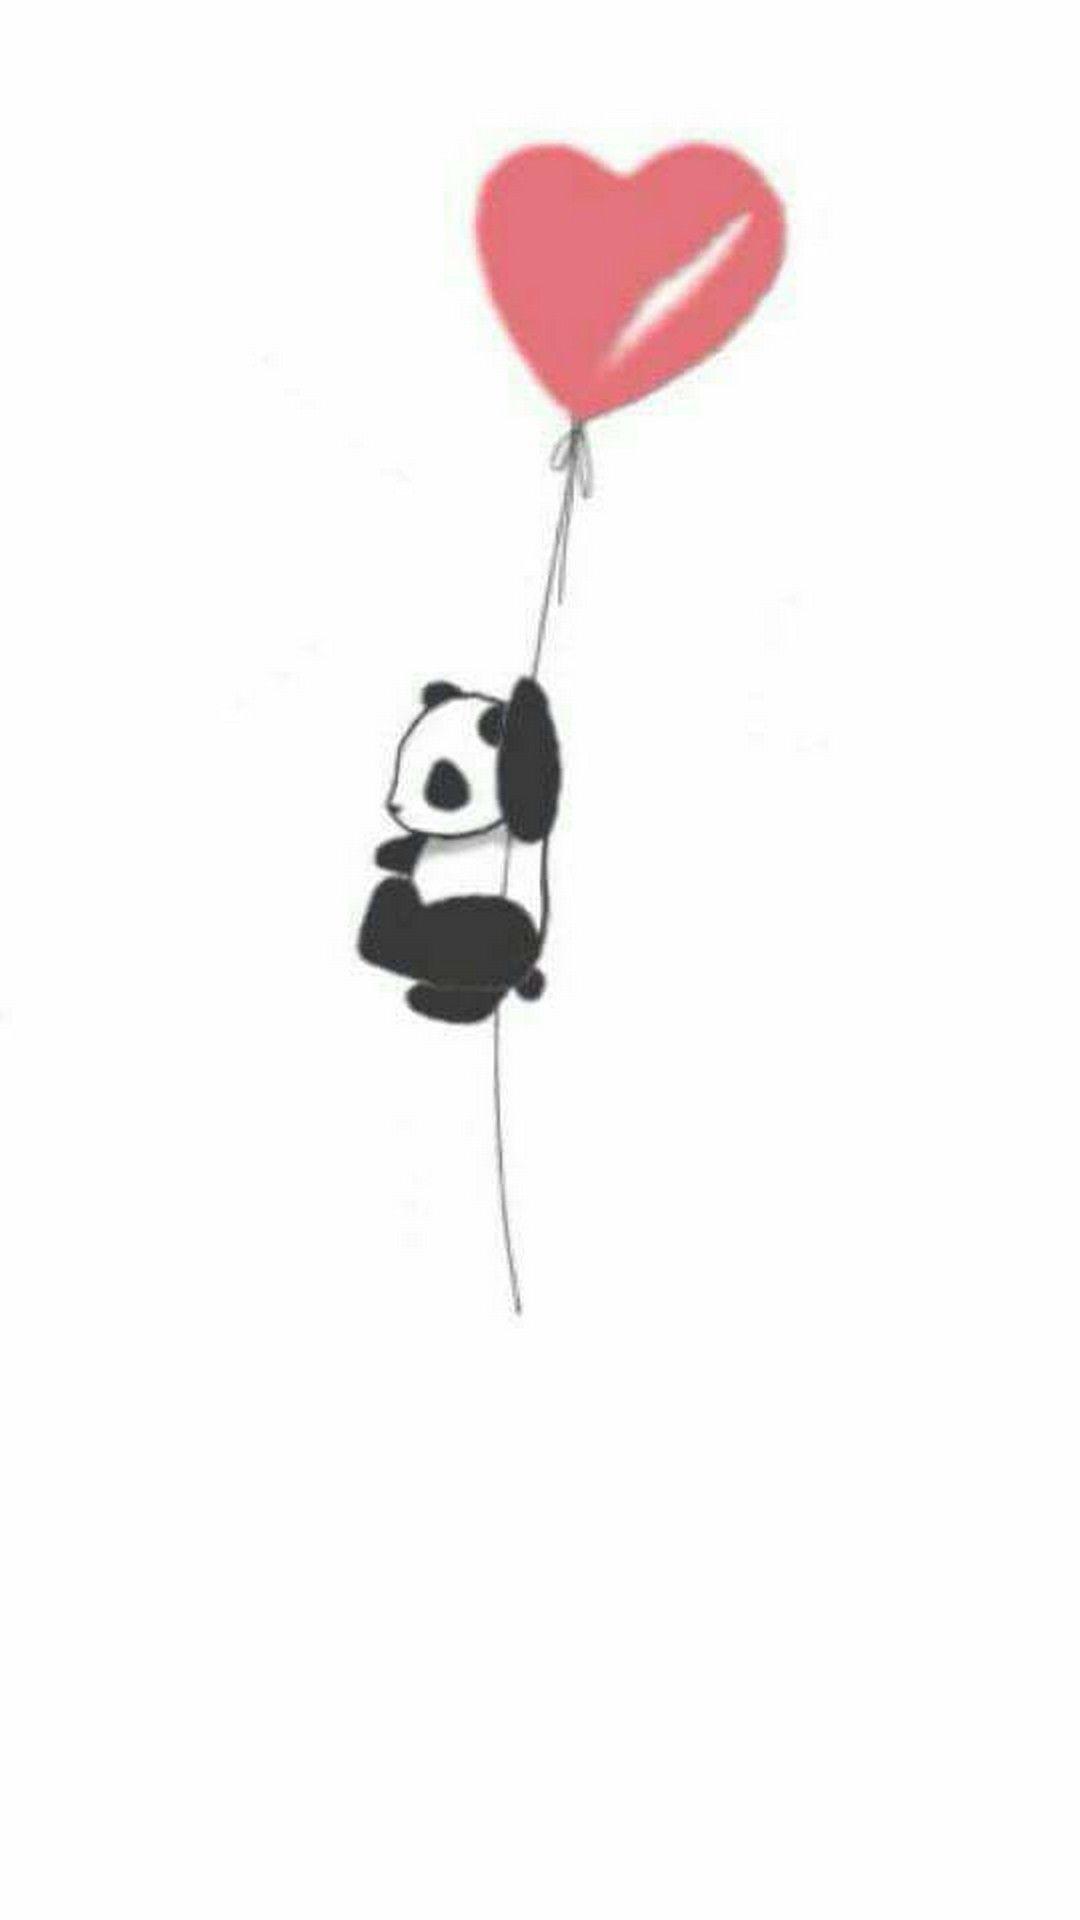 Baby Panda Wallpaper For Phone Panda With Heart Balloon